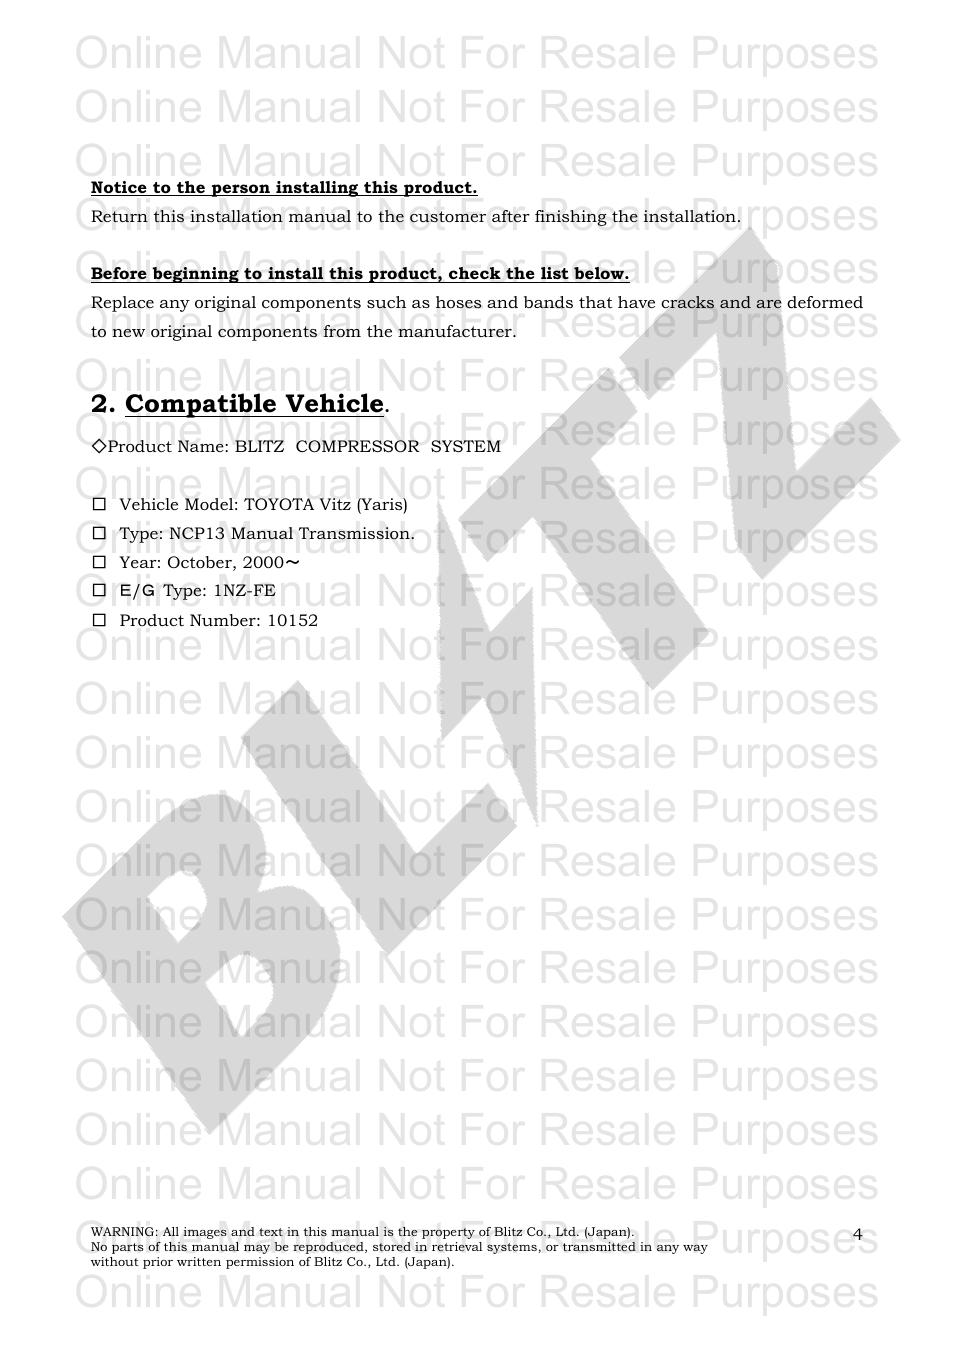 Toyota yaris ecu wiring diagram pdf 4k wiki wallpapers 2018 electrical wiring diagram 1nz fe wiring diagram and schematics asfbconference2016 Choice Image